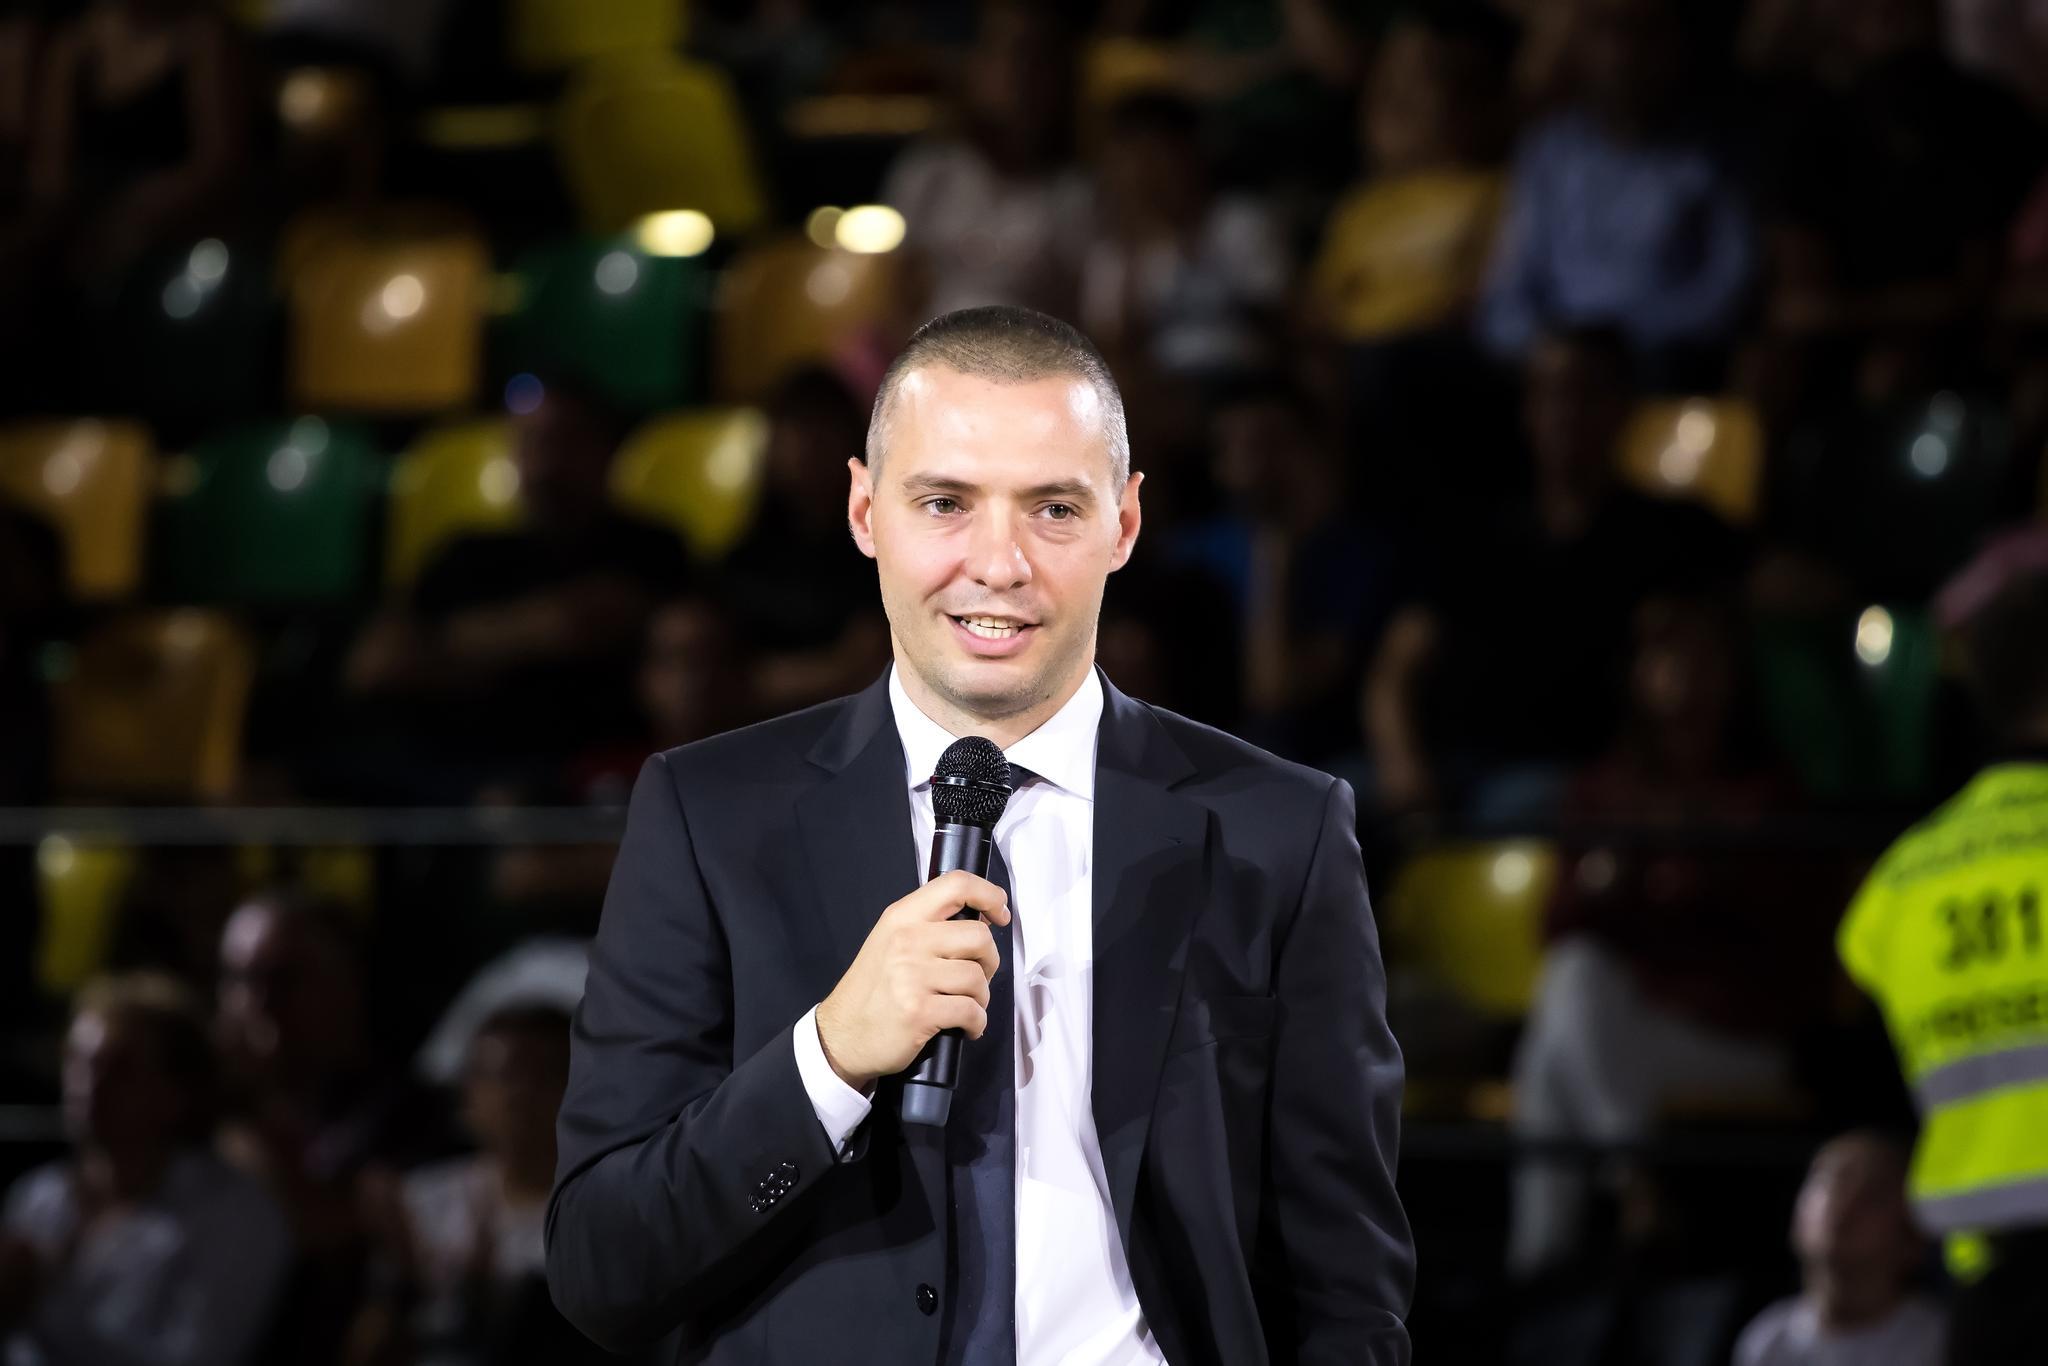 Javi Salgado, micrófono en mano (Foto: Luis Fernando Boo).